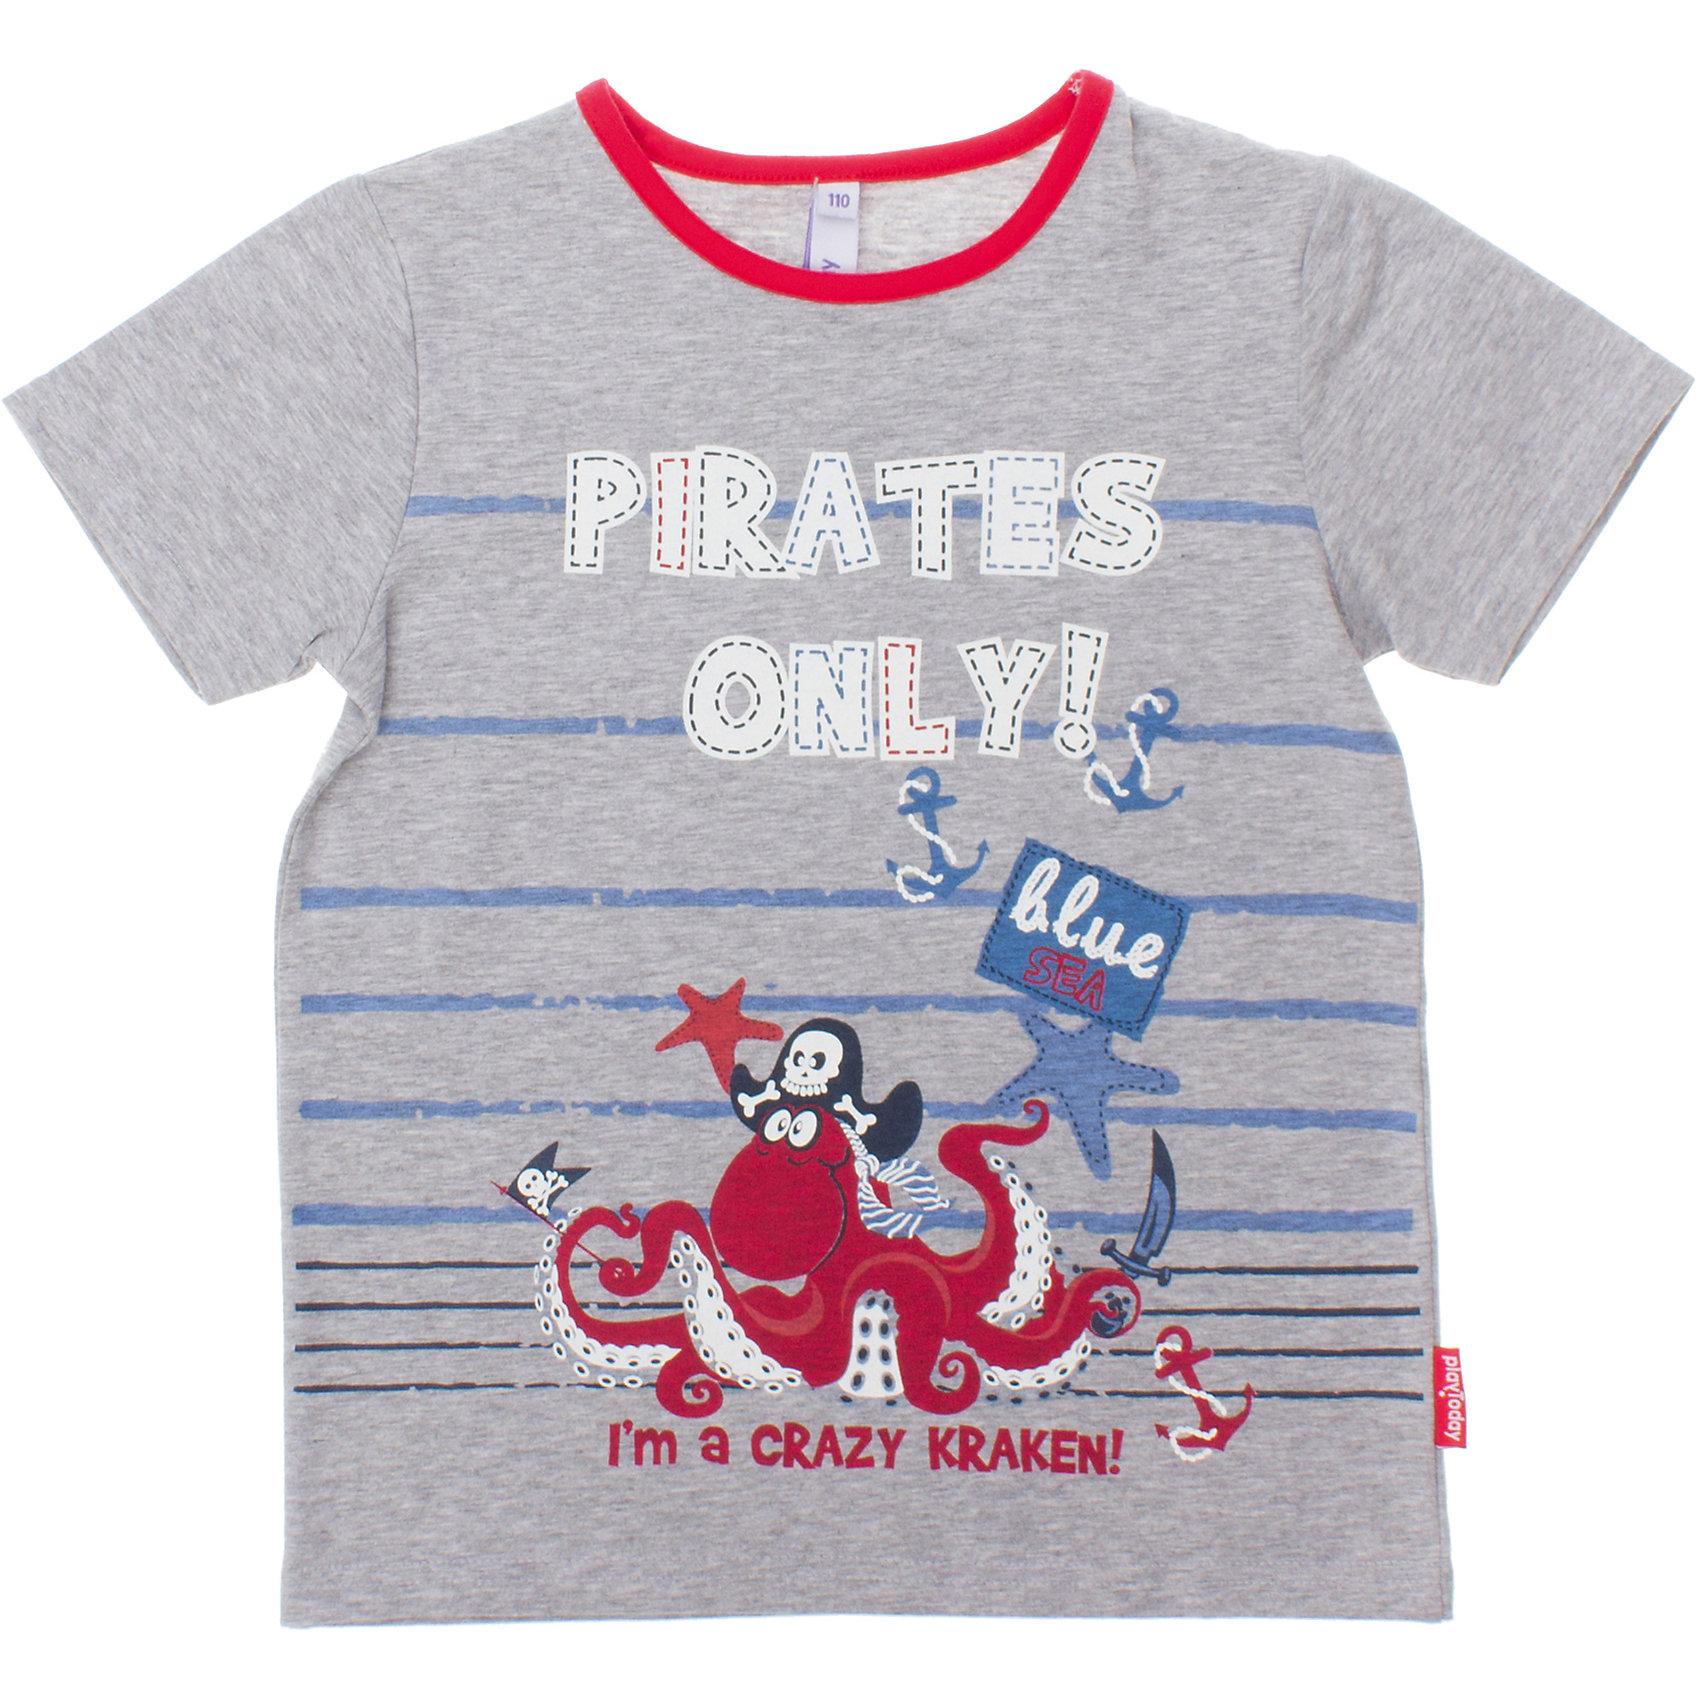 PlayToday Футболка для мальчика PlayToday trybeyond футболка для мальчика 999 74498 00 40z серый trybeyond